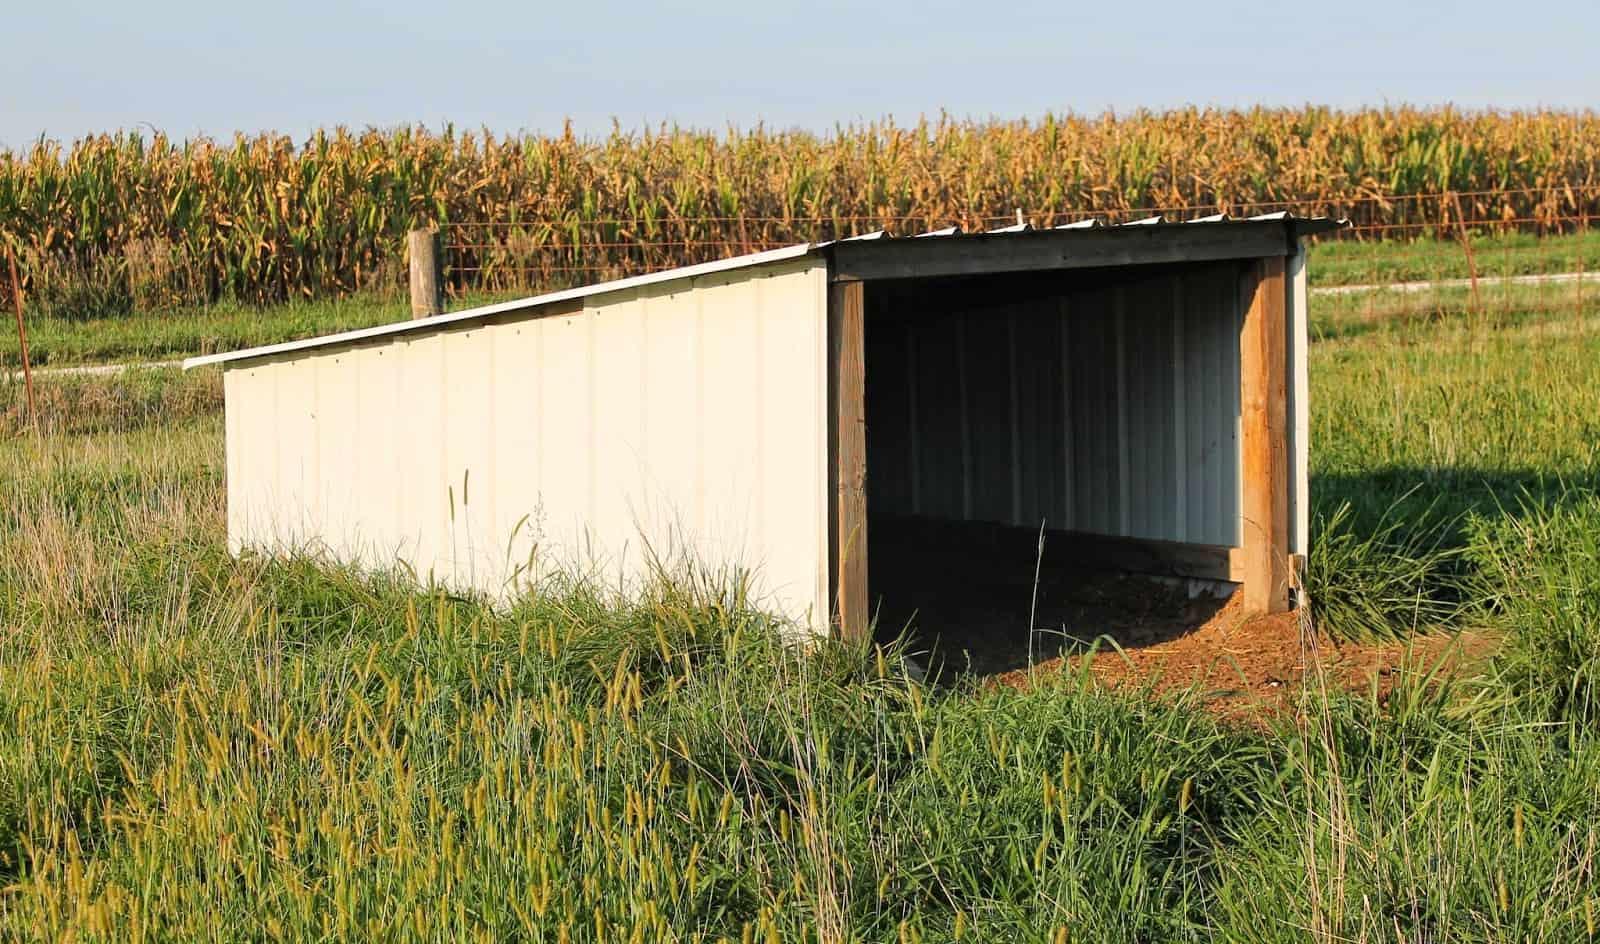 ^ Sheltering your goats - he hrifty Homesteader